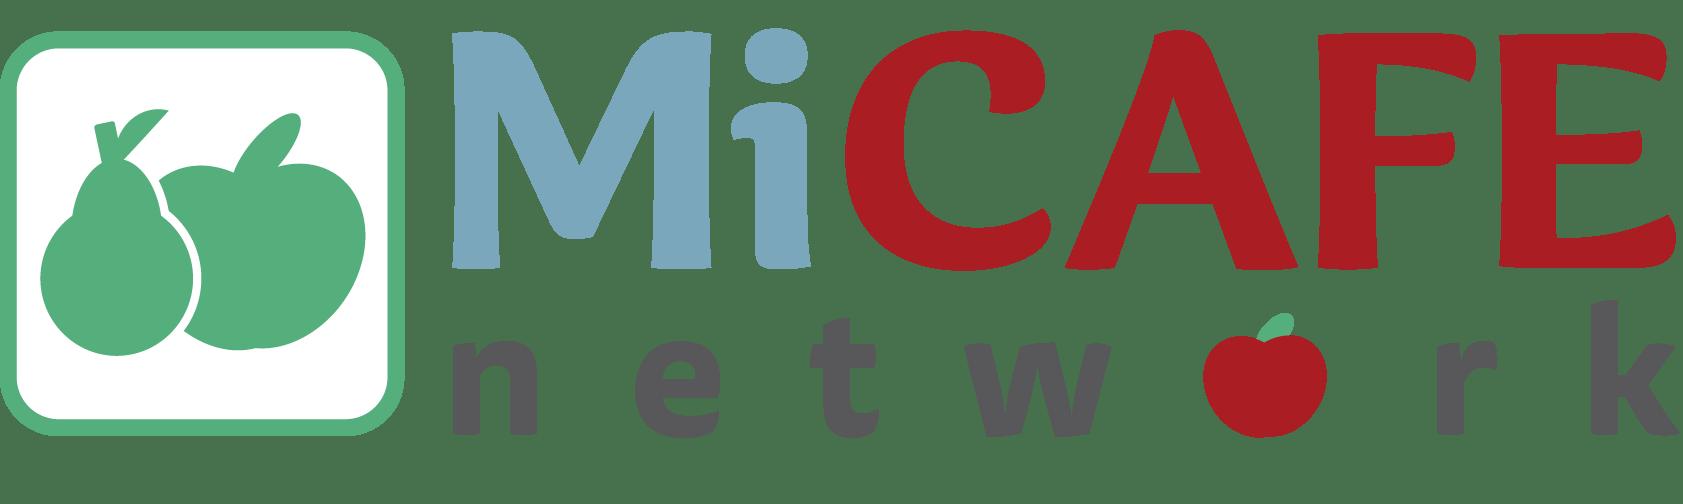 MiCAFE Network logo